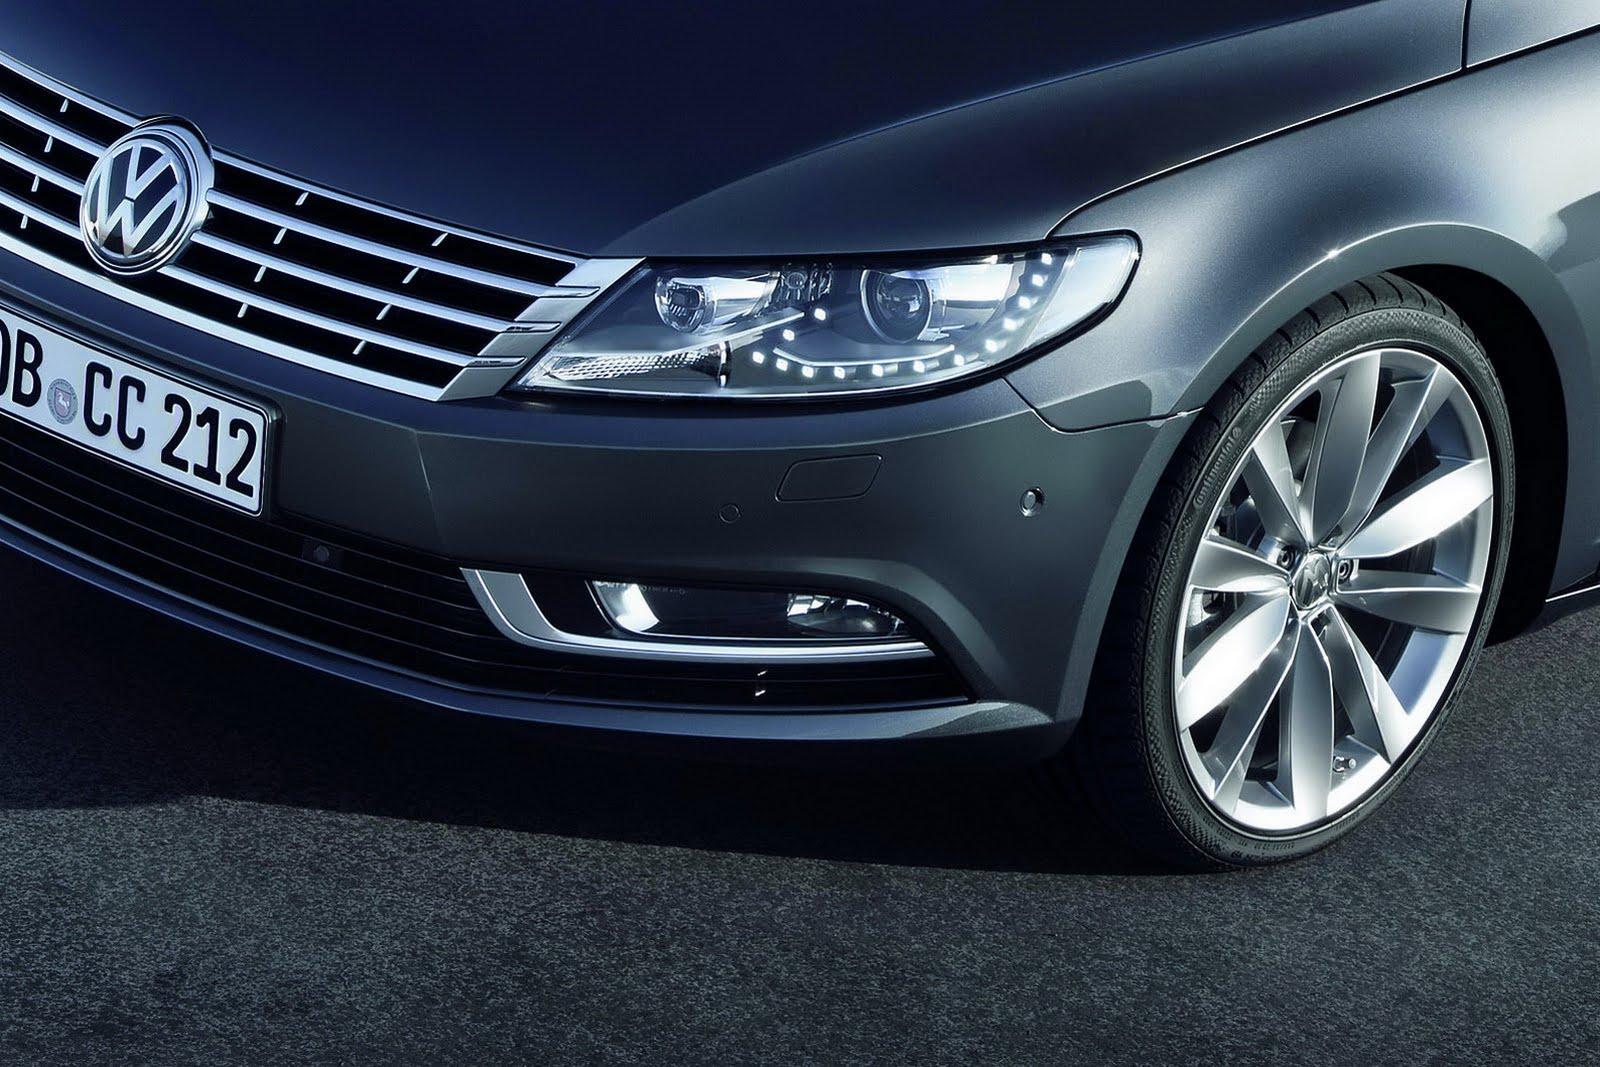 Volkswagen cc facelifted 2013 autooonline magazine